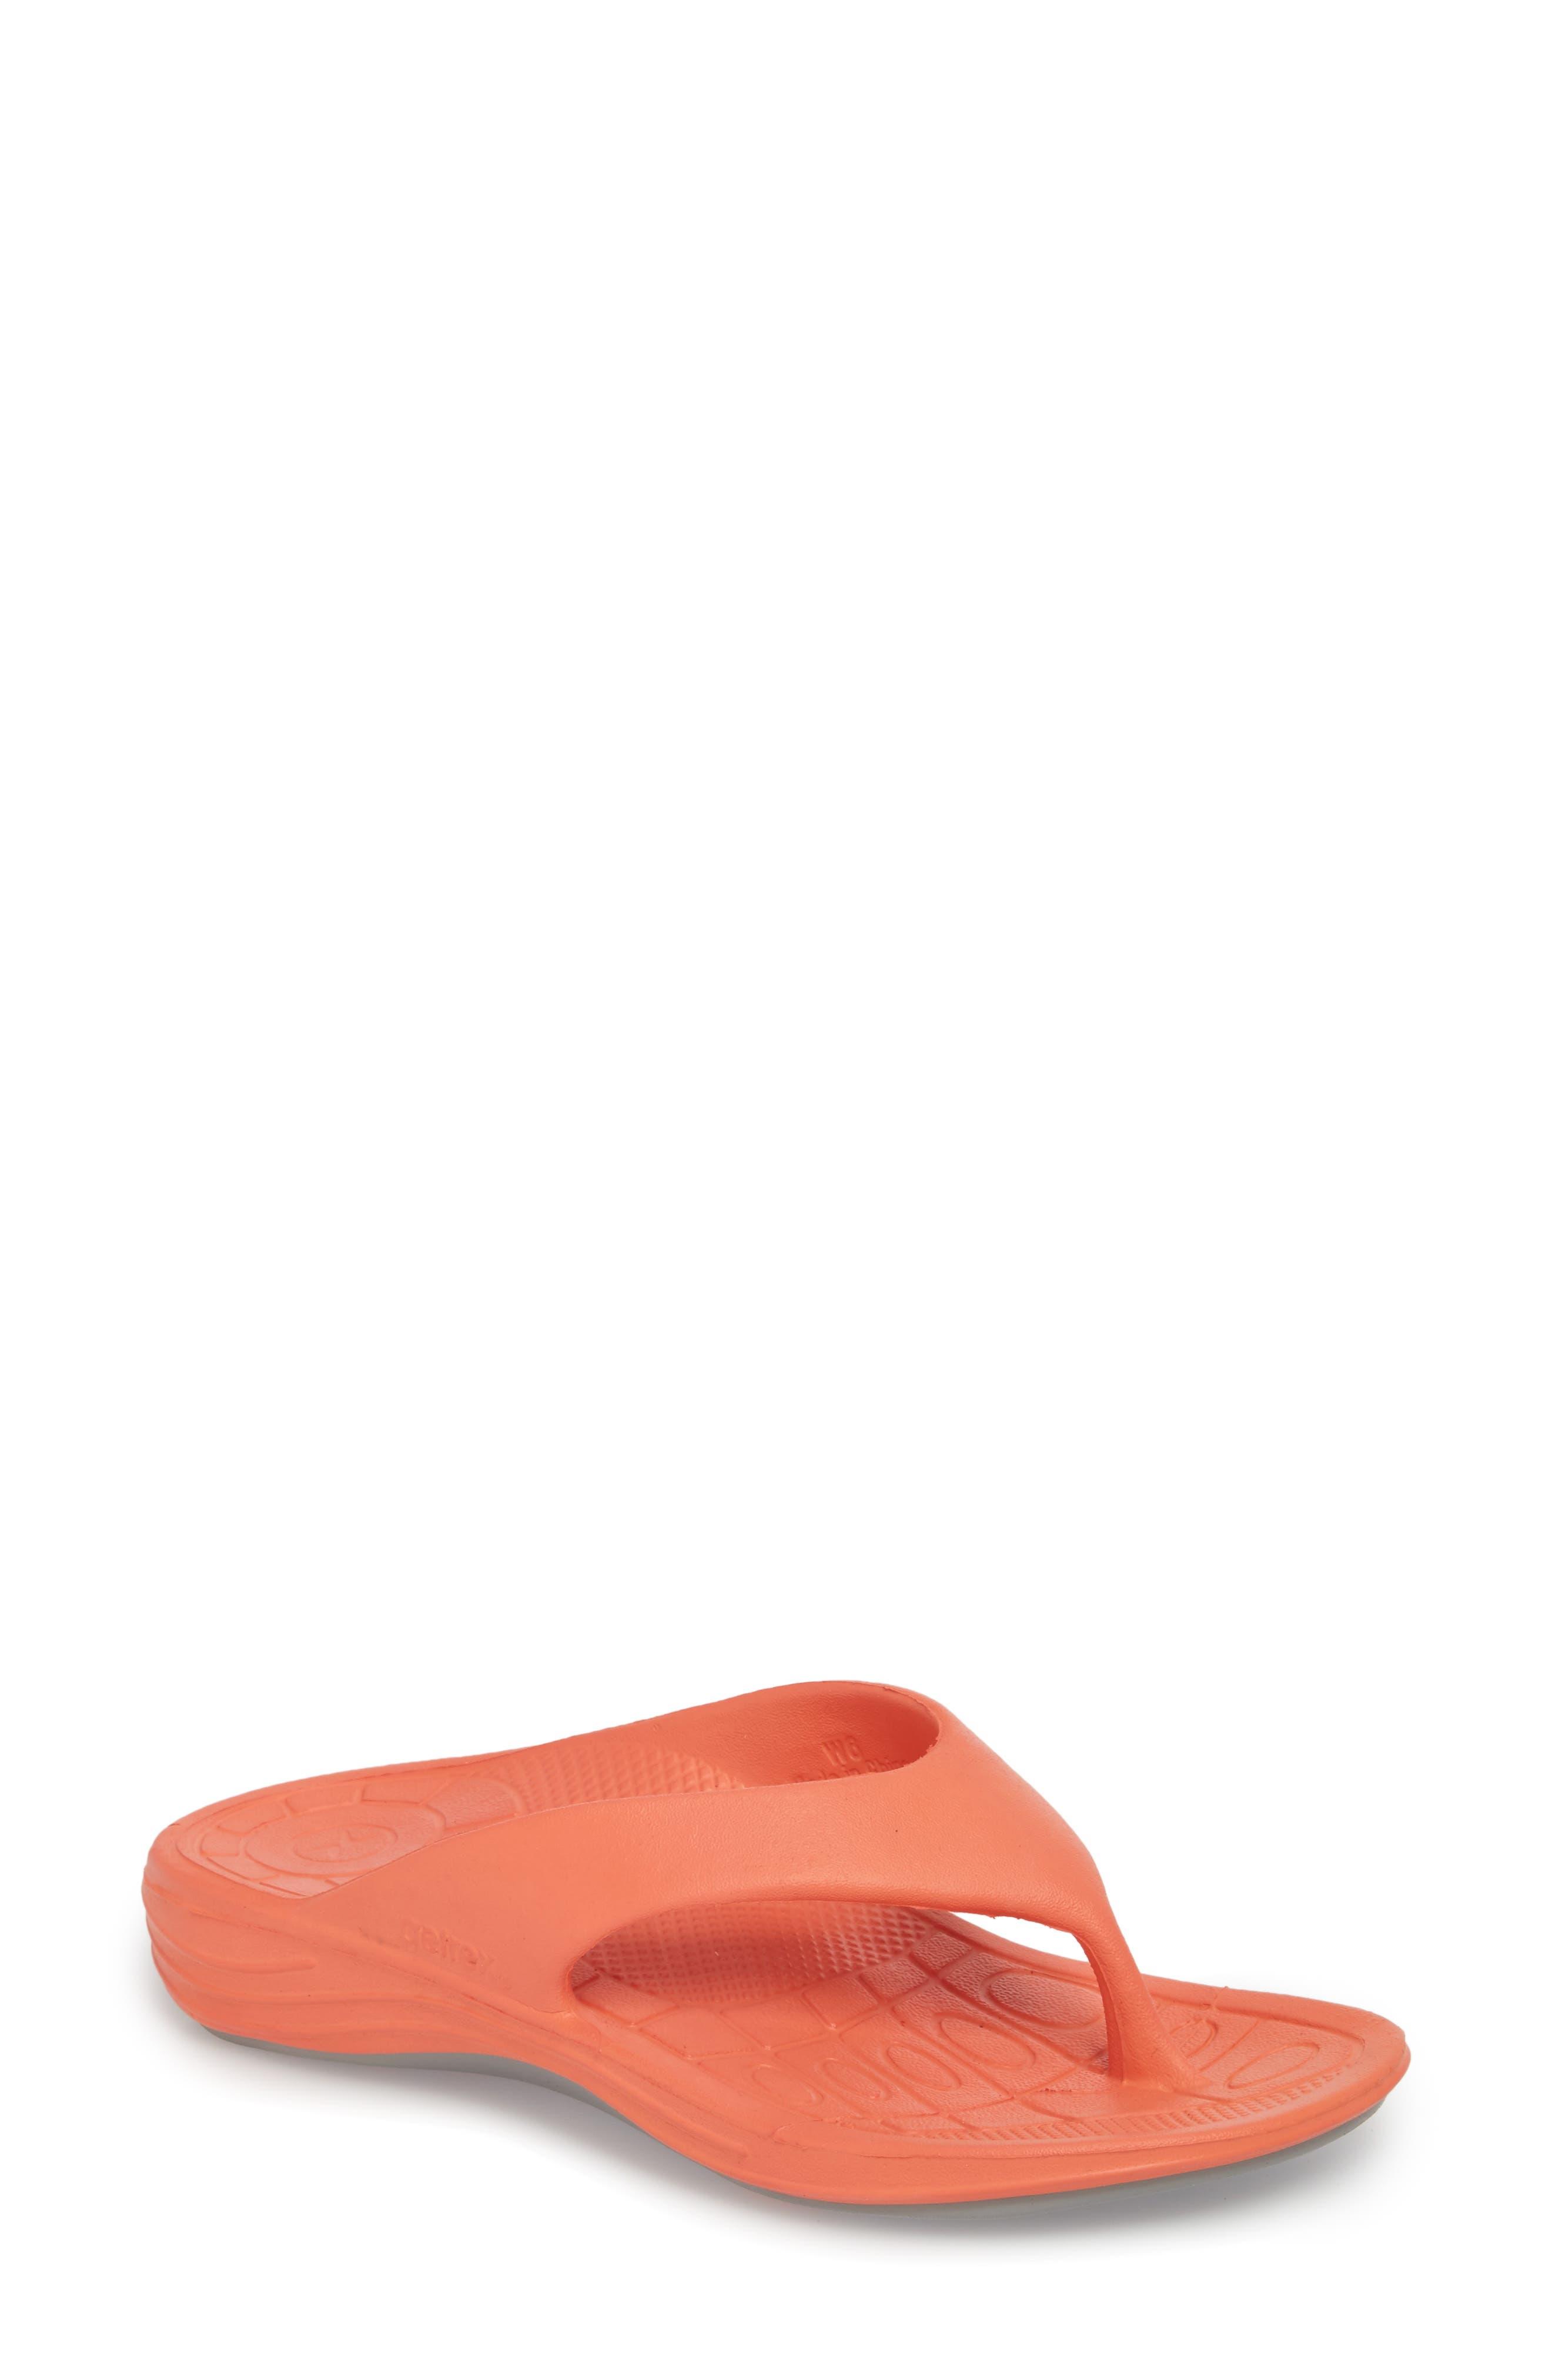 Aetrex Lynco Flip Flop, Orange